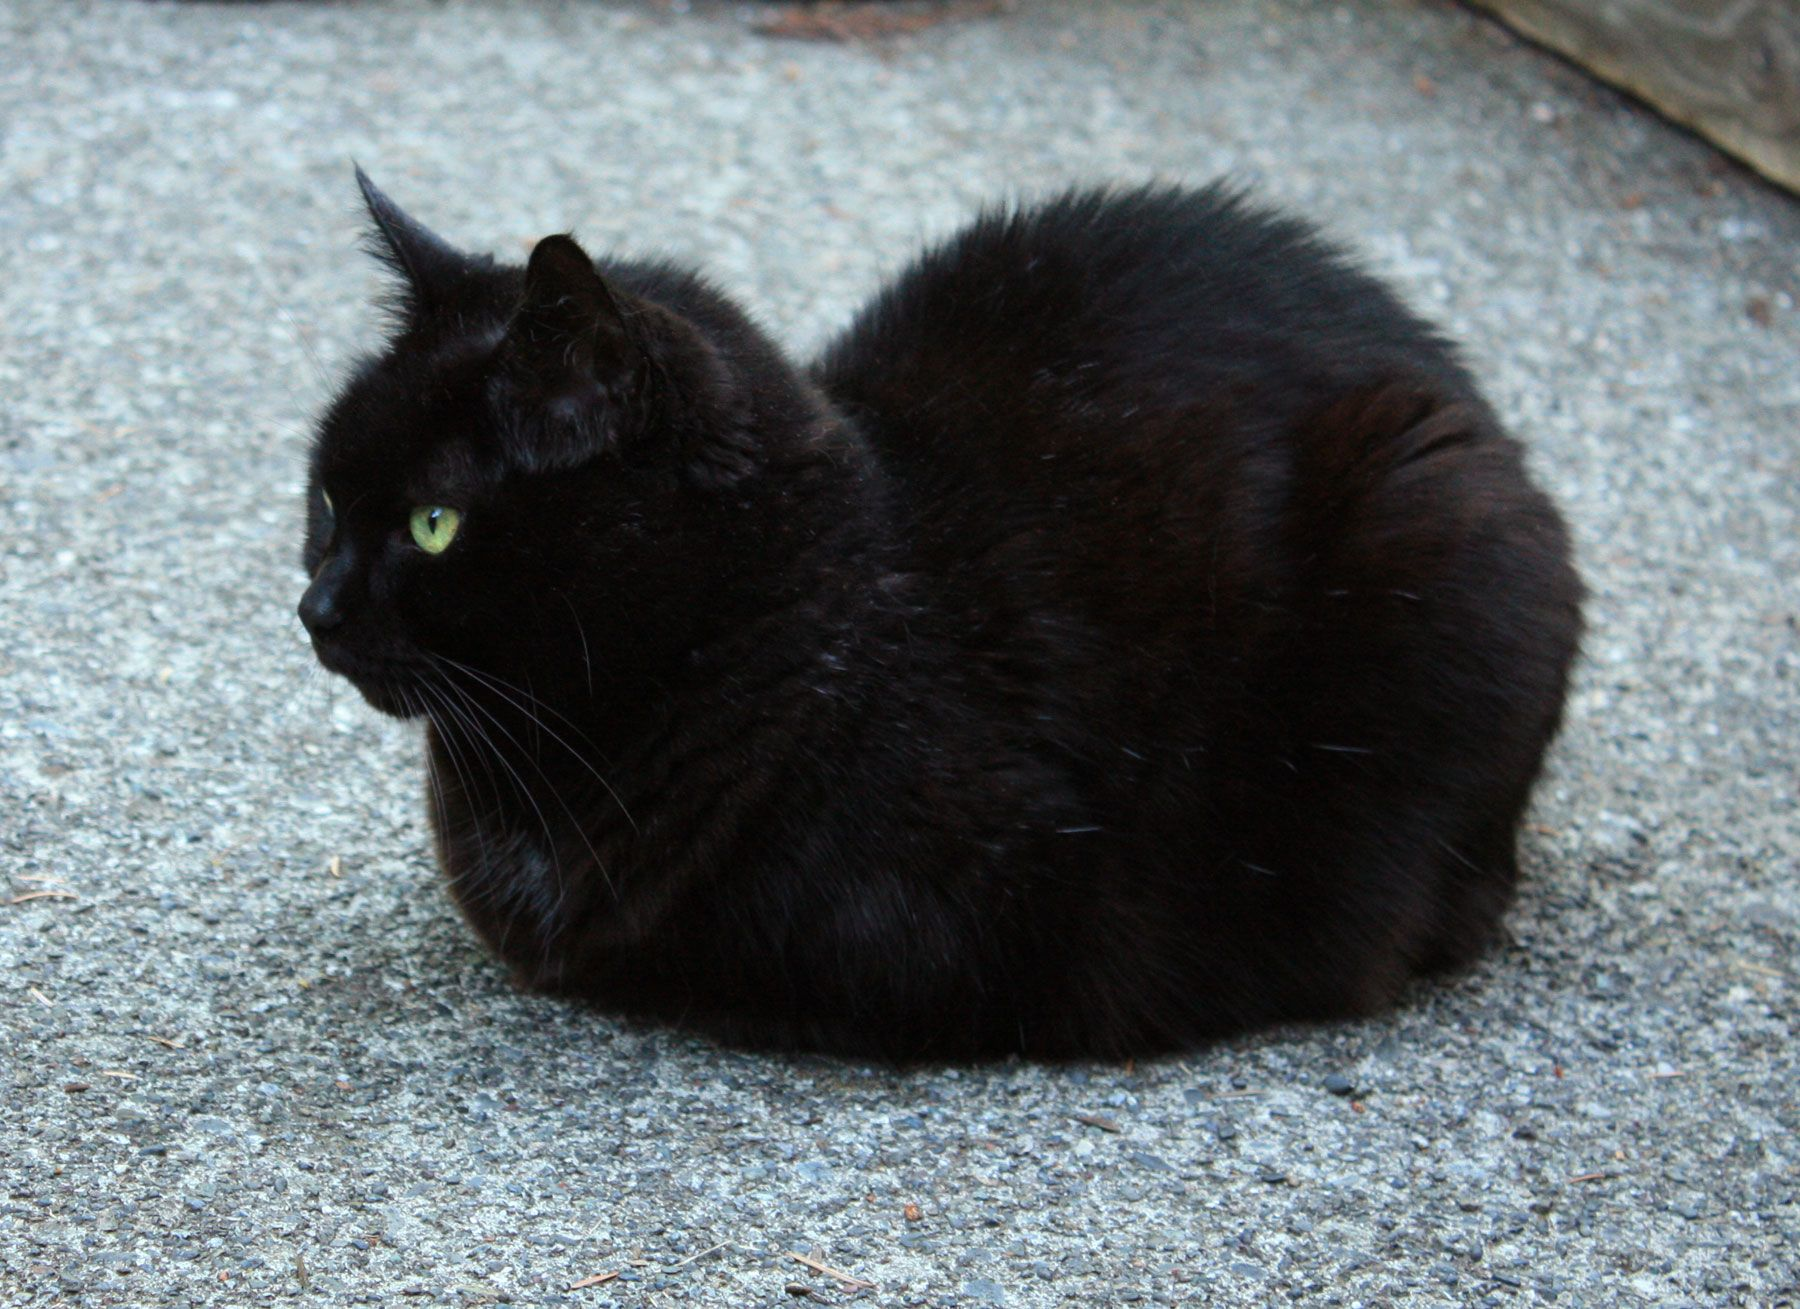 Black Loaf cats, Ragdoll kittens for sale